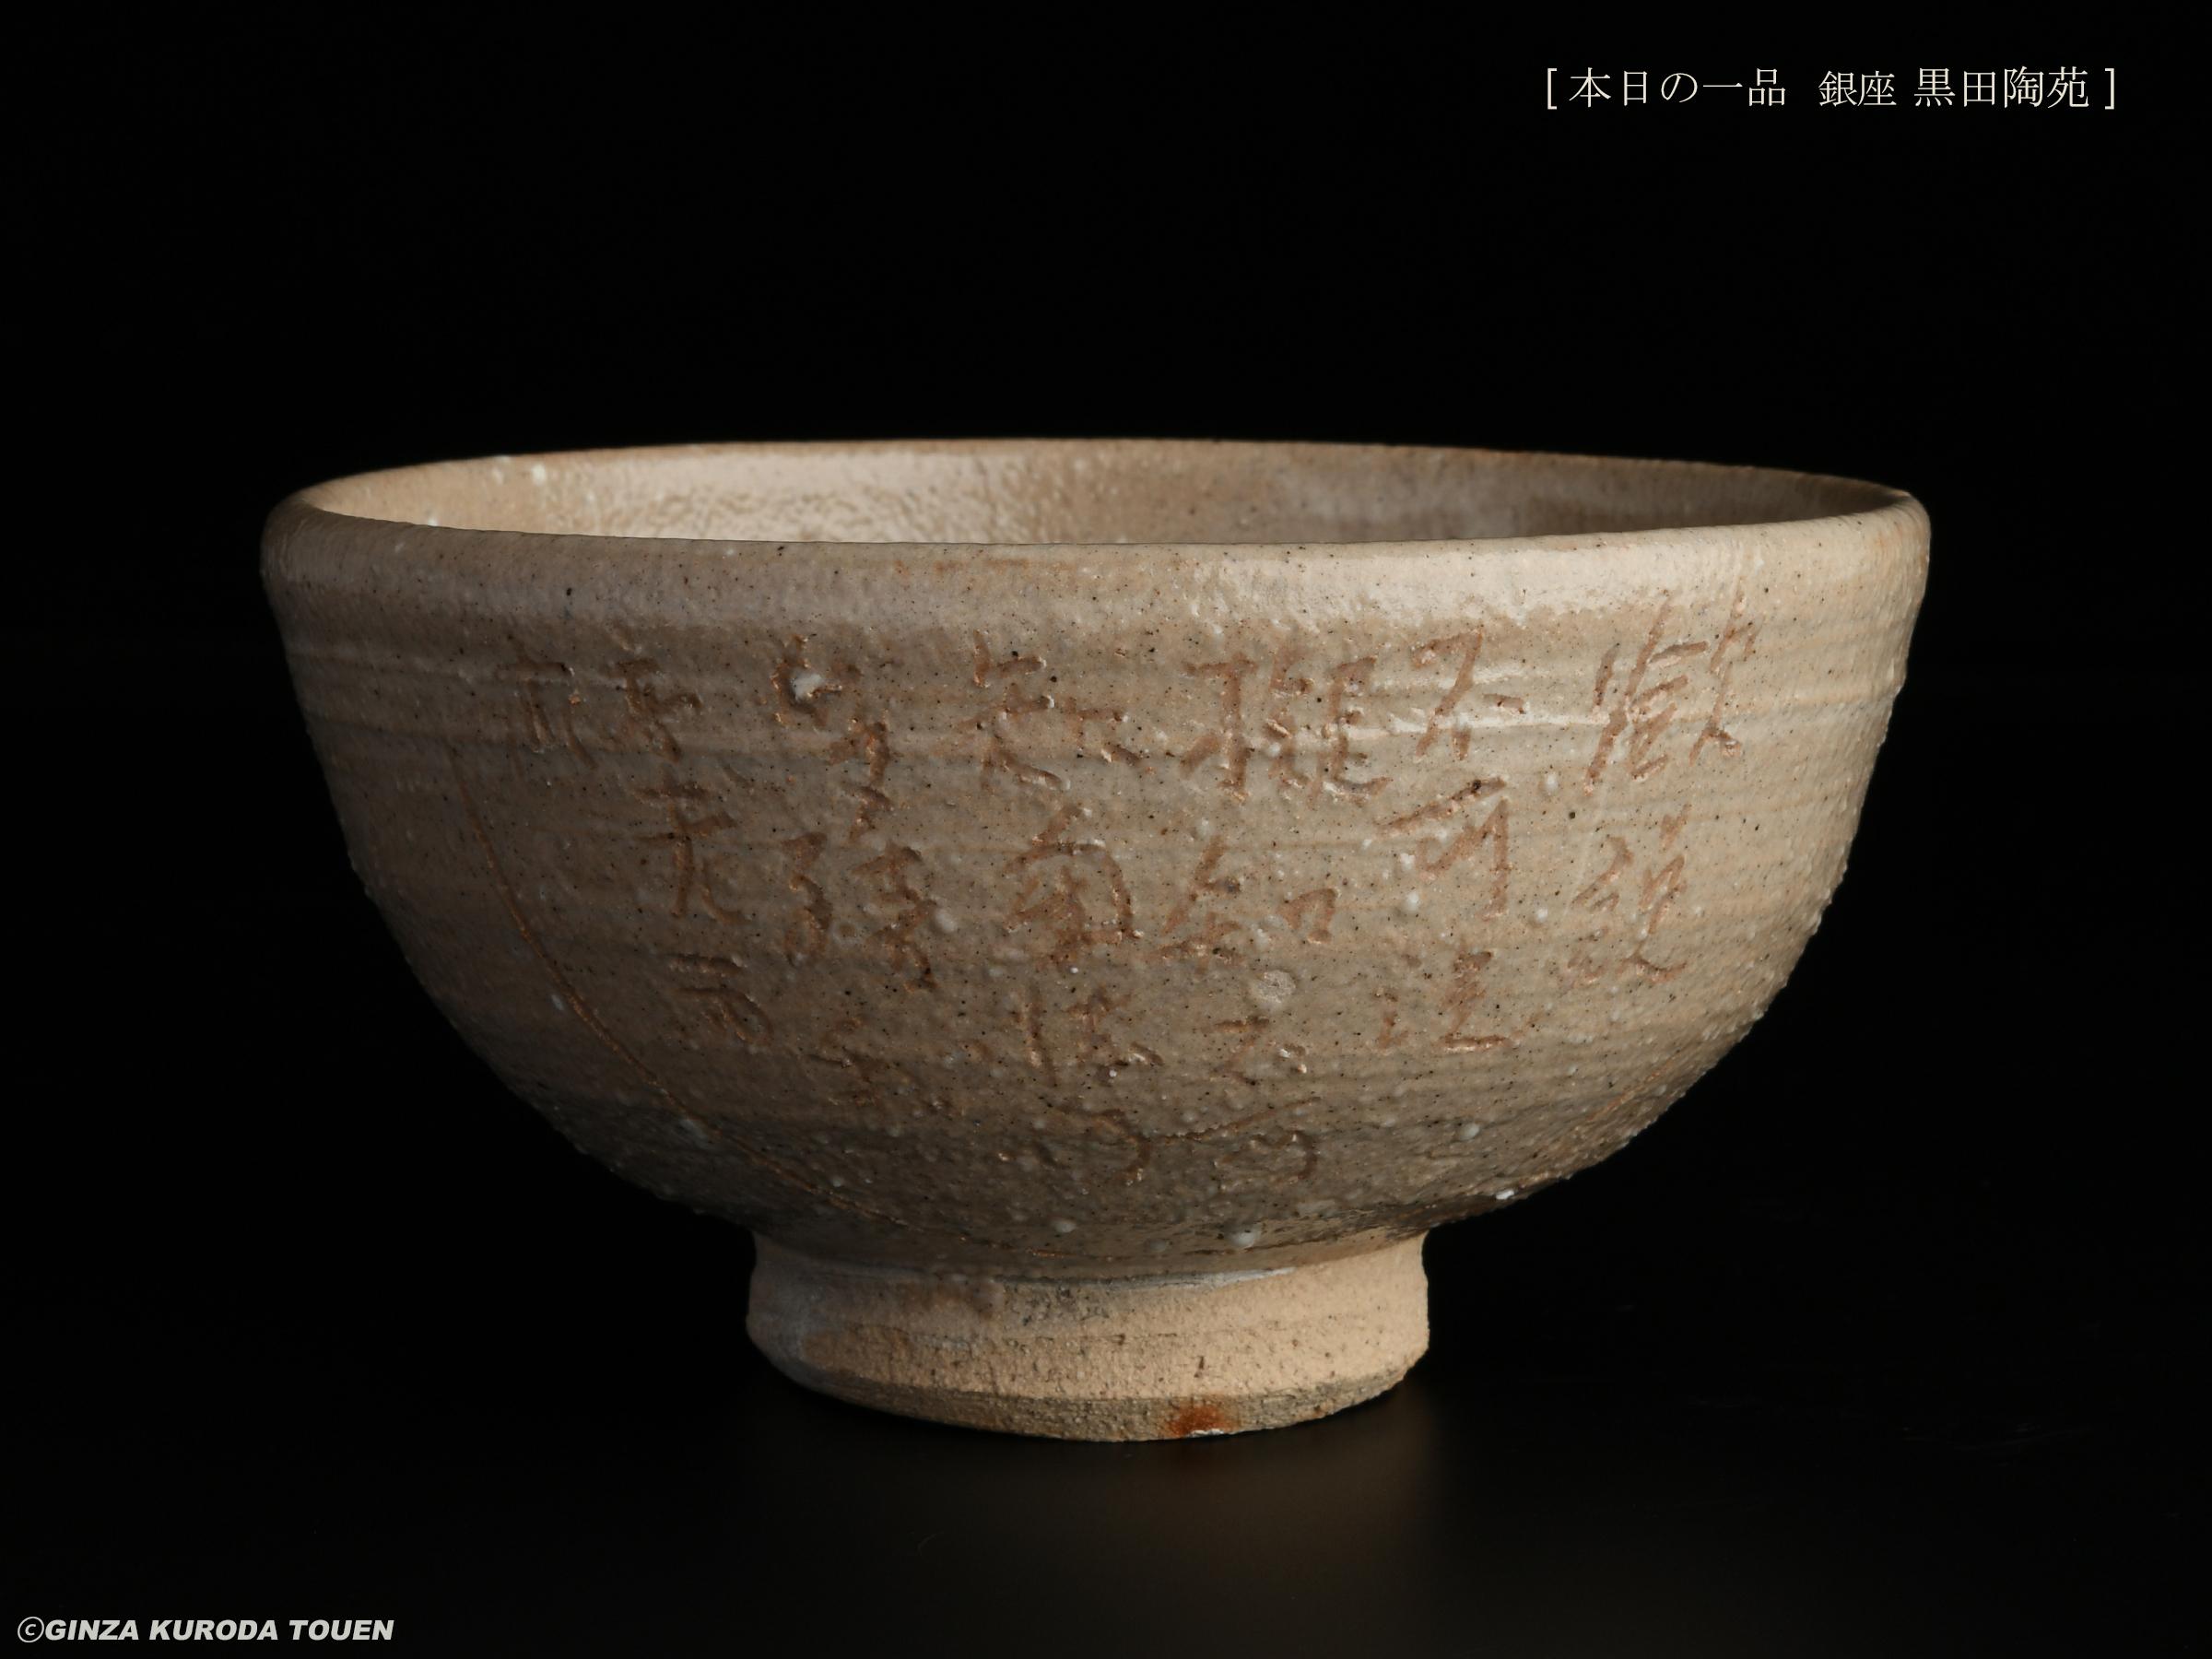 Munemaro Ishiguro: Tea bowl